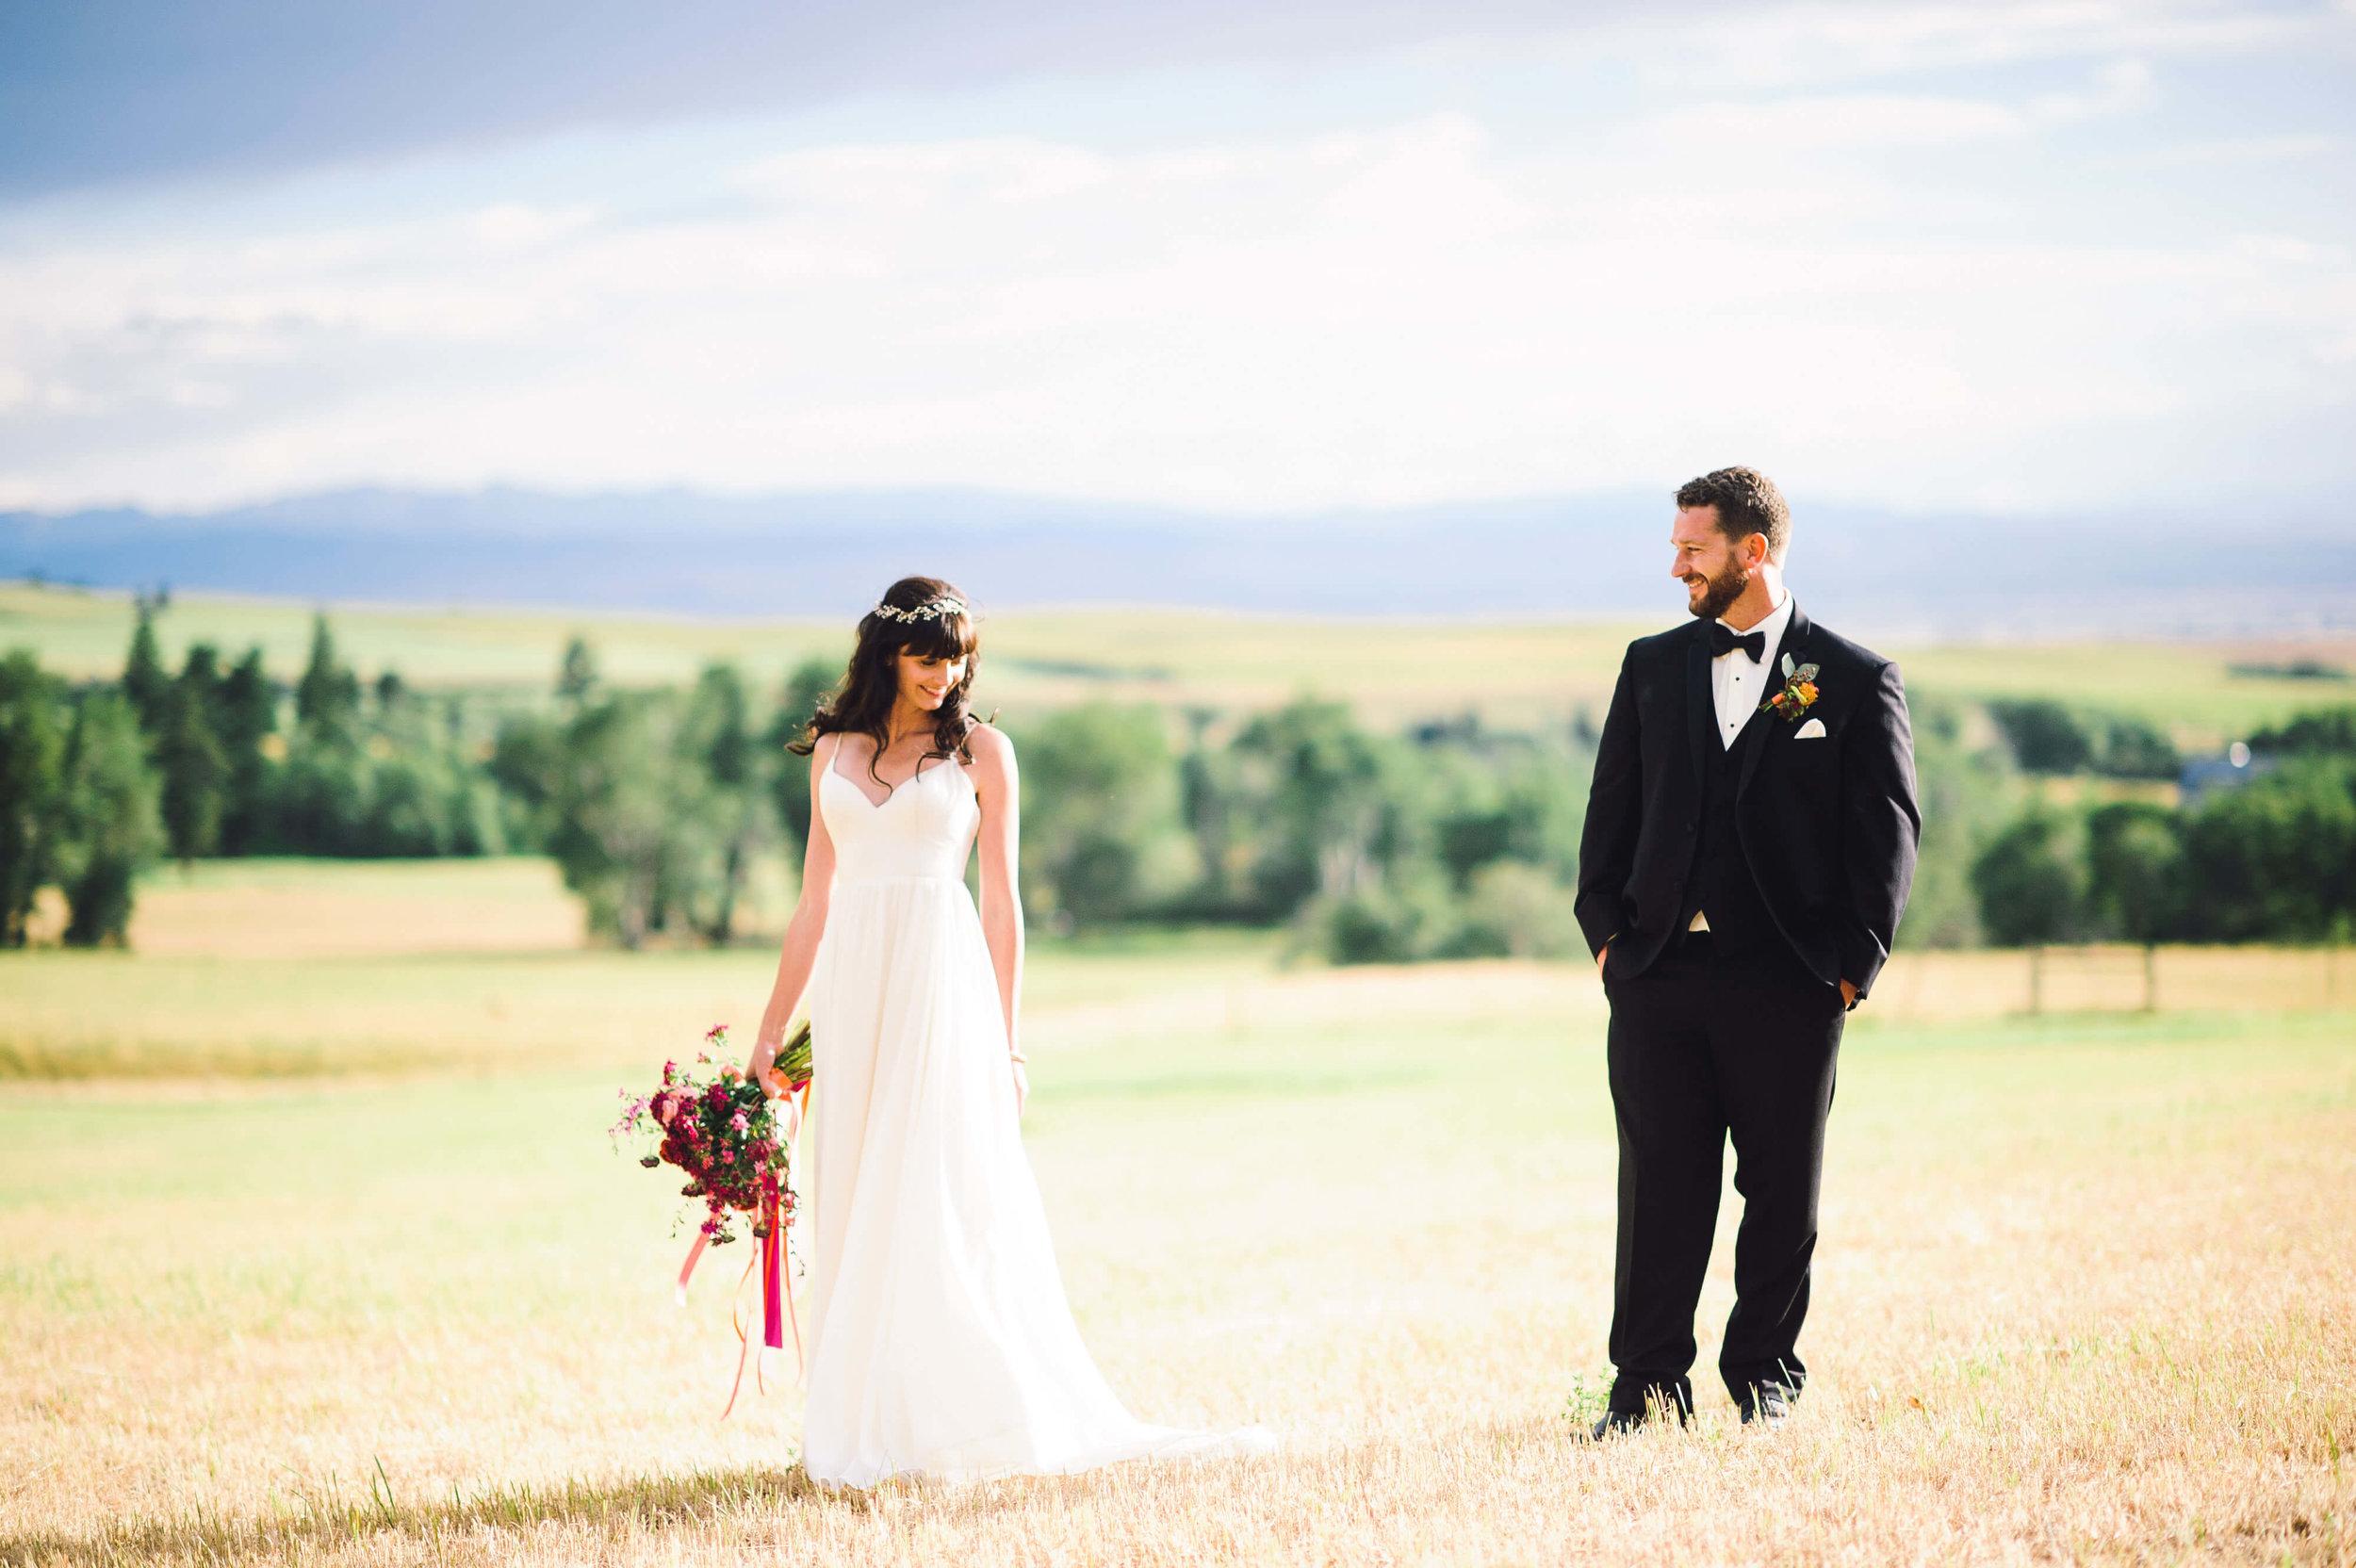 engle-olson-fran-ze-photo-montana-wedding-95.jpg